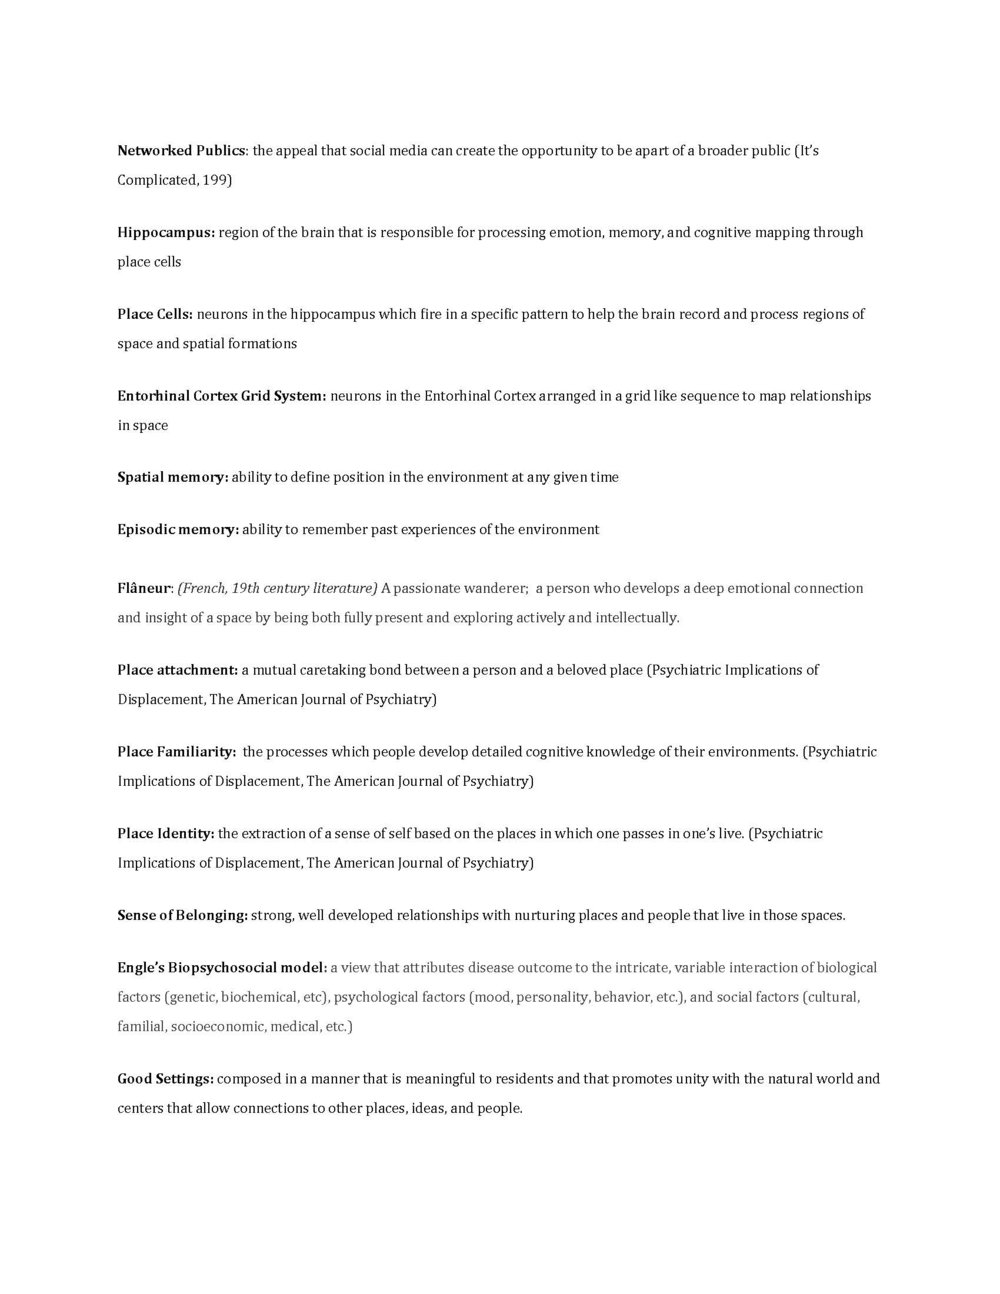 vocabularylist_Page_3.jpg